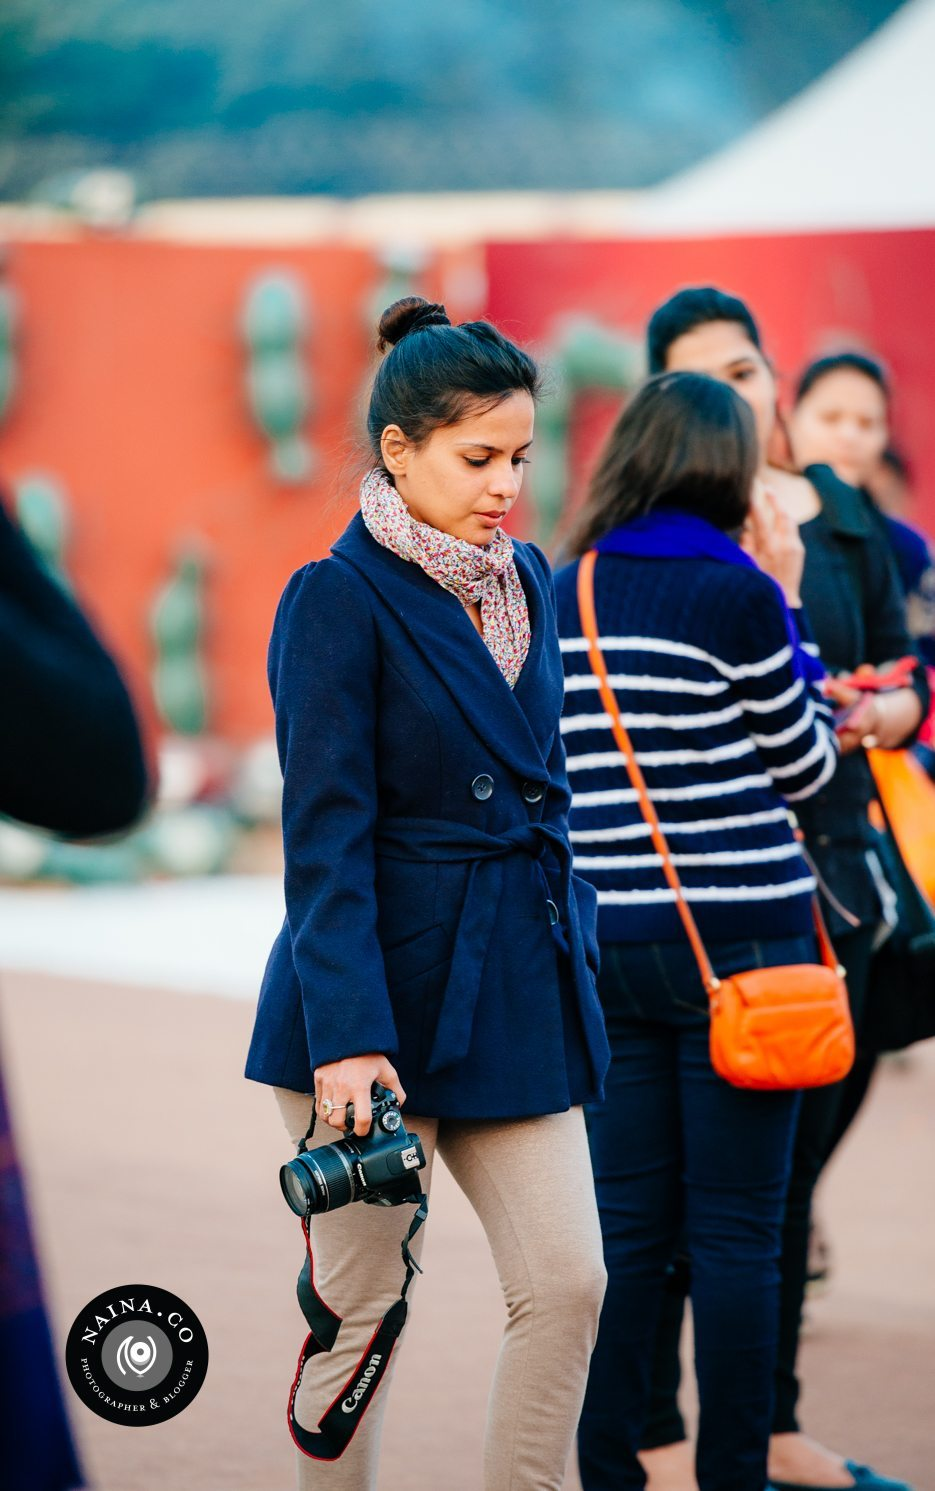 Naina.co-Raconteuse-Visuelle-Photographer-Blogger-Storyteller-Luxury-Lifestyle-January-2015-Le-Meridien-India-Art-Fair-Coffee-EyesForStreetSstyle-08